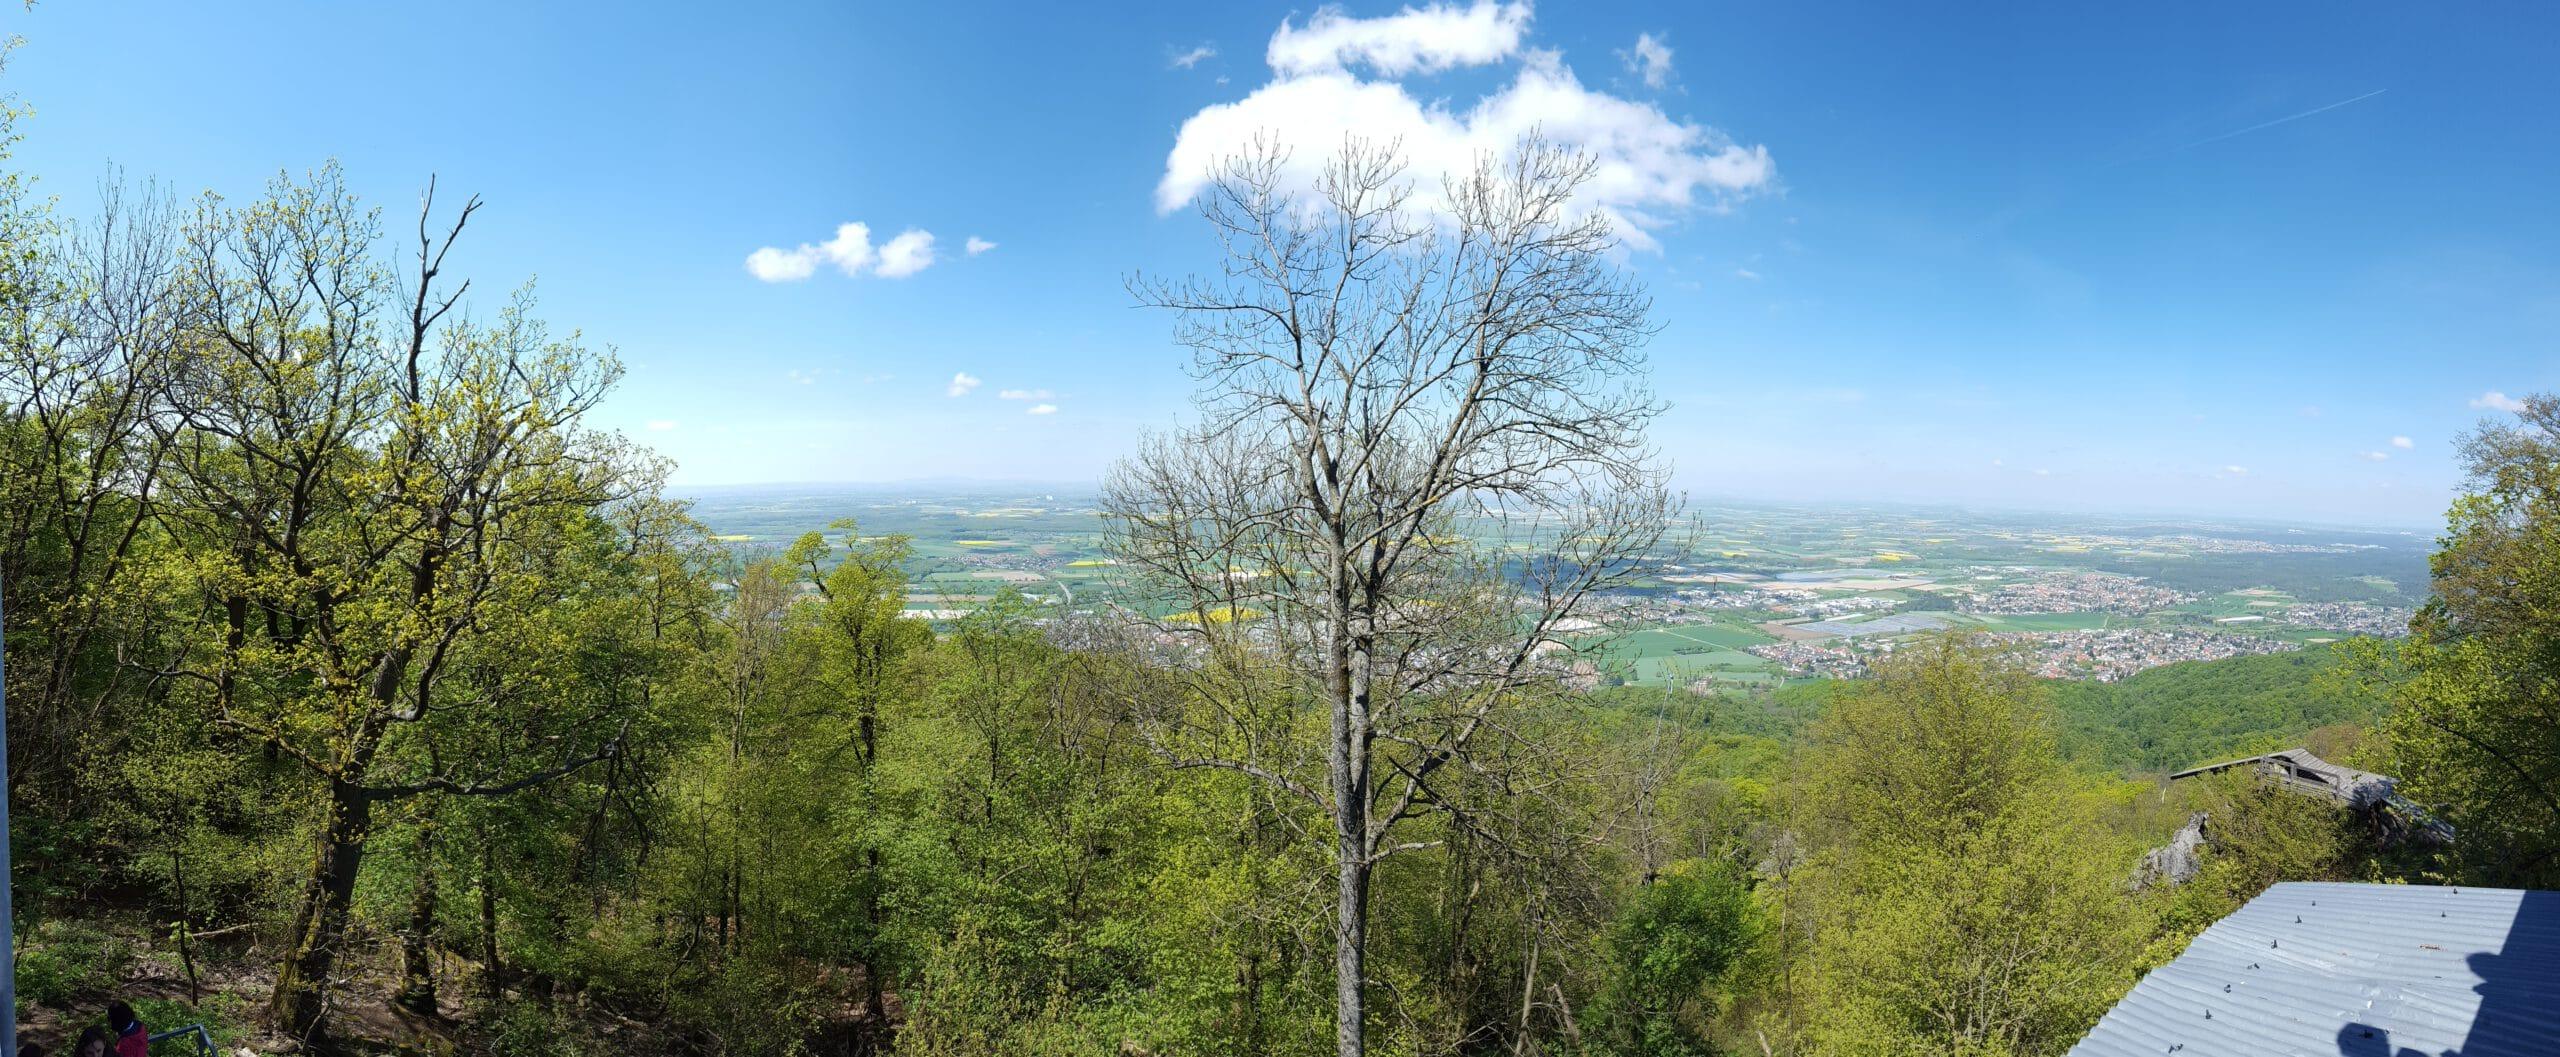 Ausblick vom Melibokus